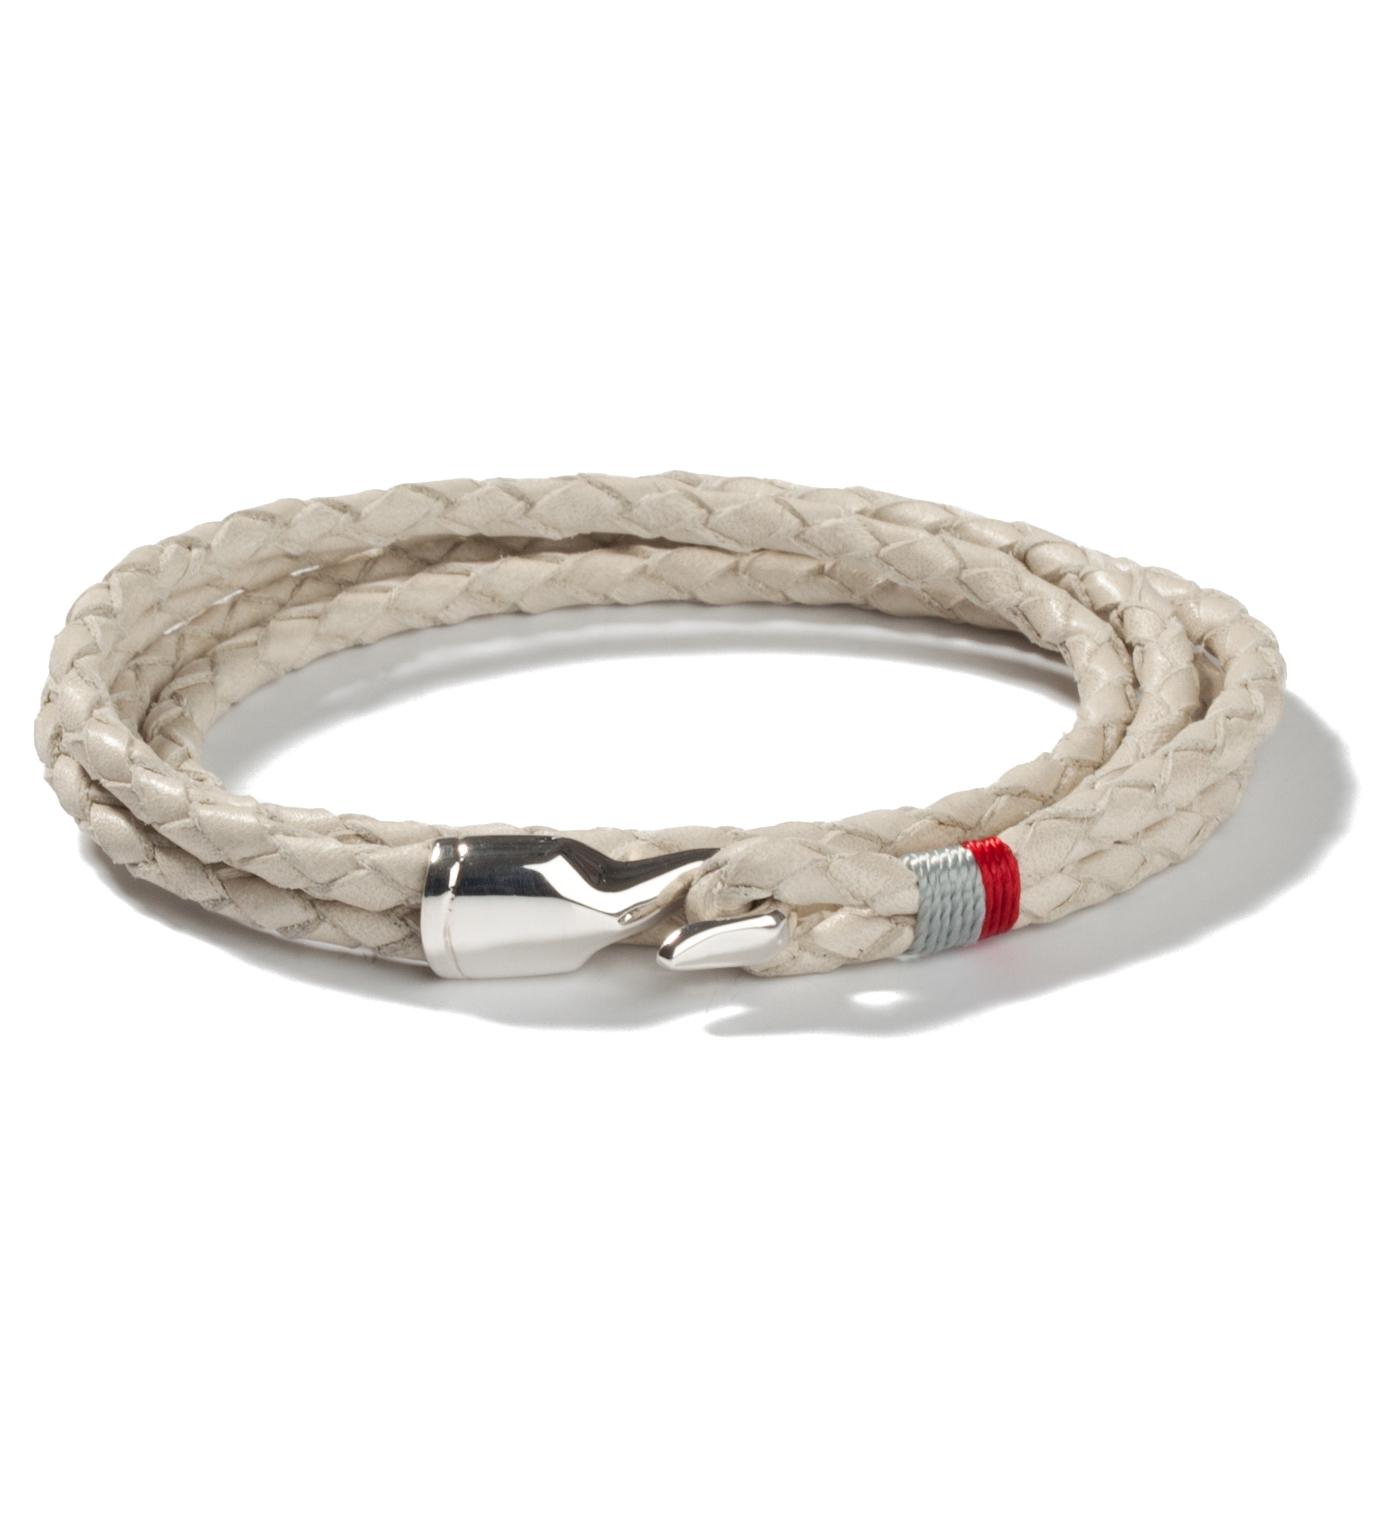 Miansai Cement Trice Silver Bracelet